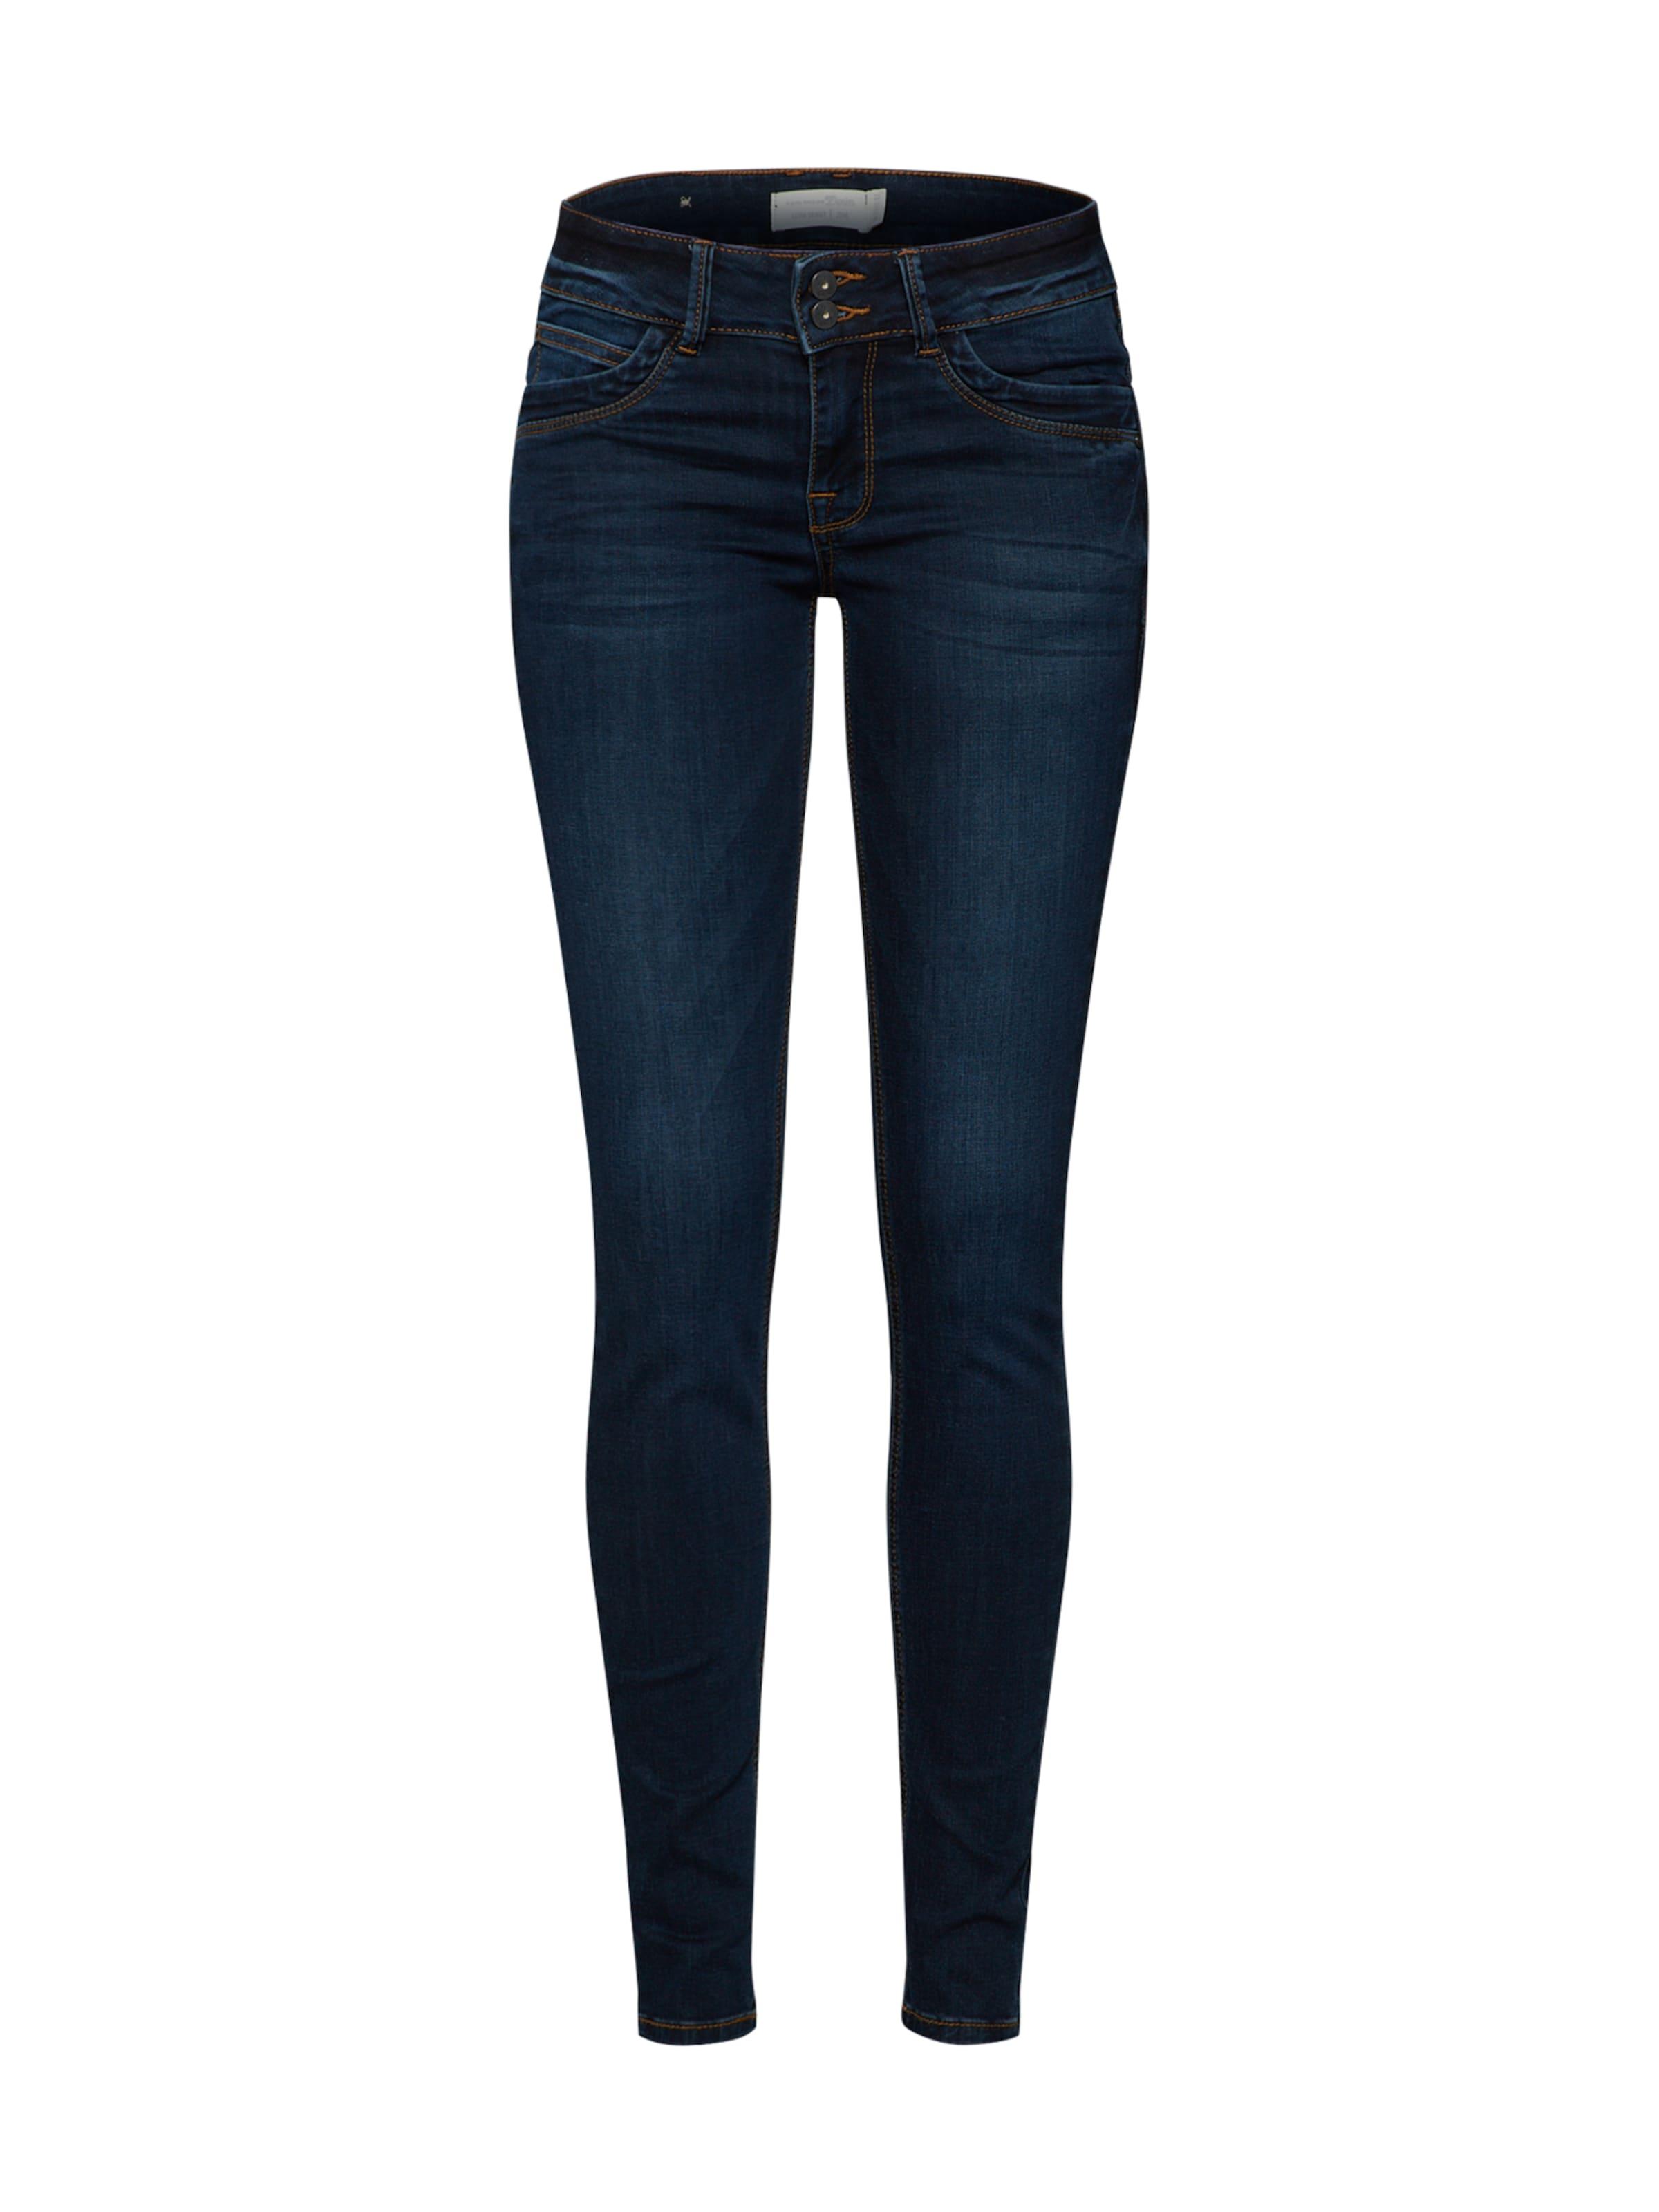 In Blue Denim Jeans Tom Tailor eWrQCBoEdx